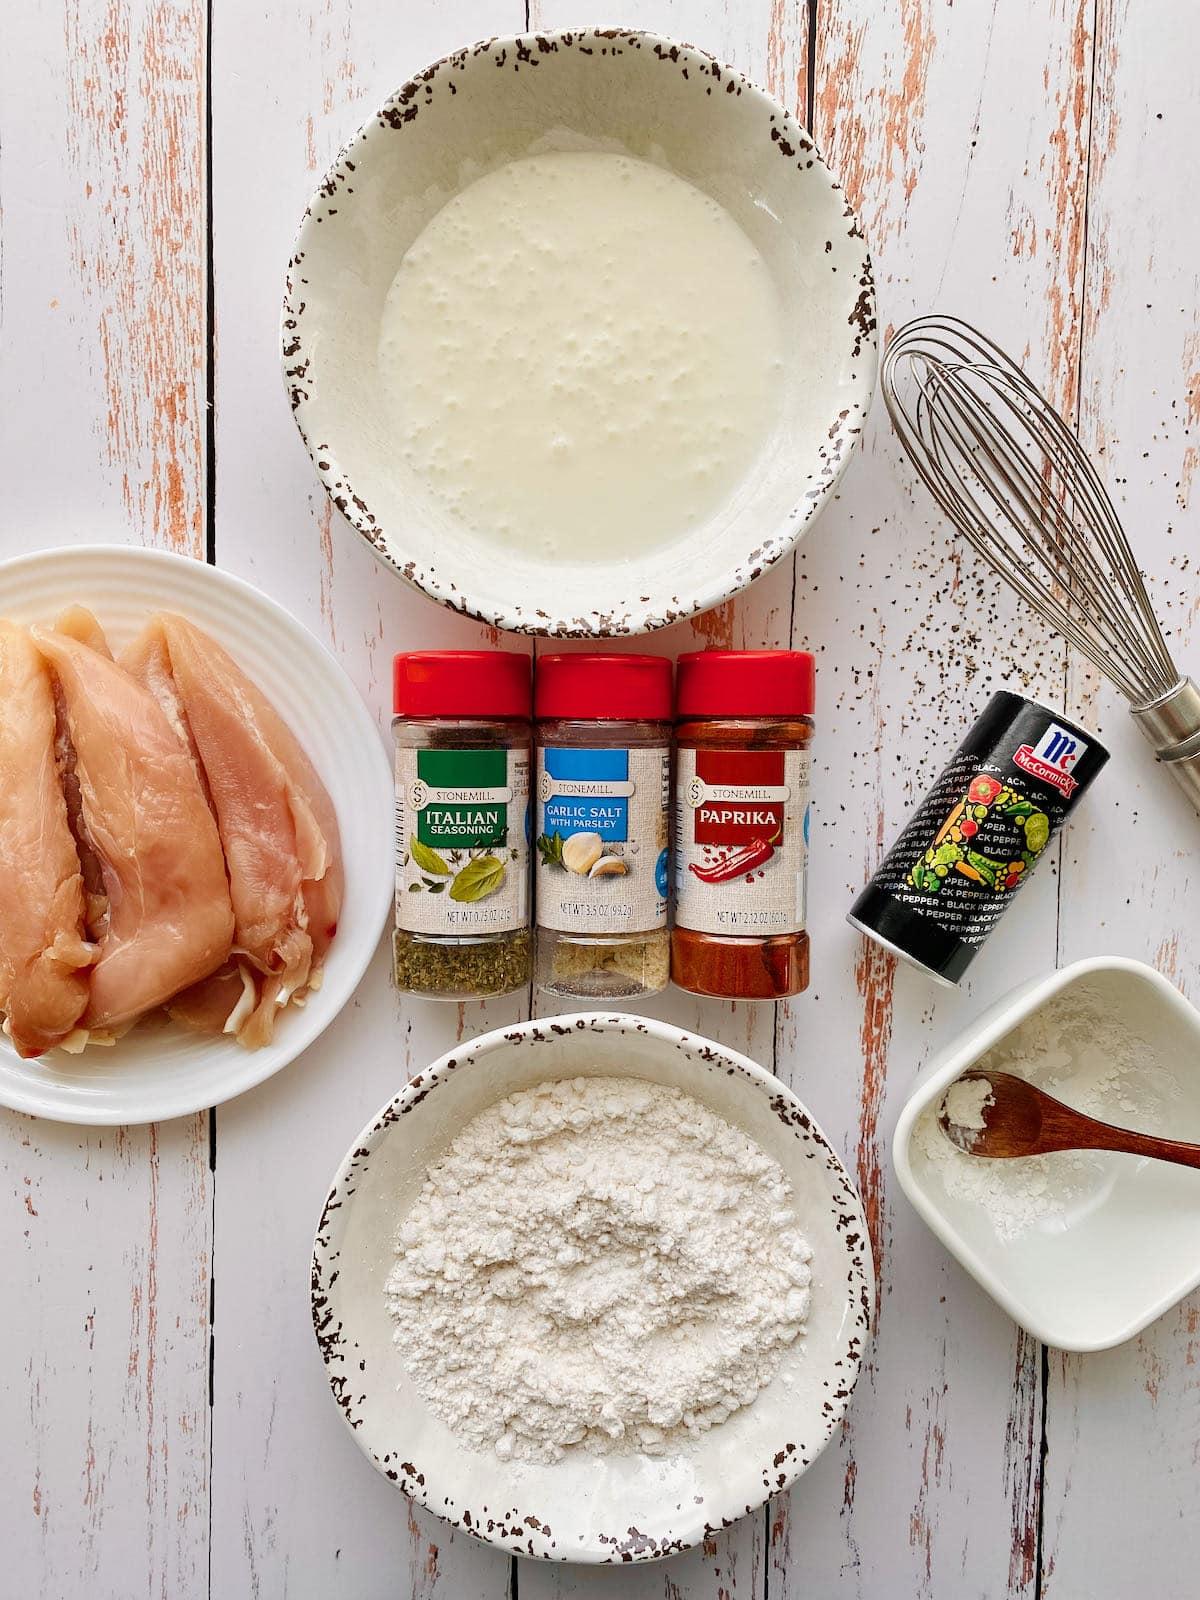 ingredients needed for buttermilk chicken tenders recipe.